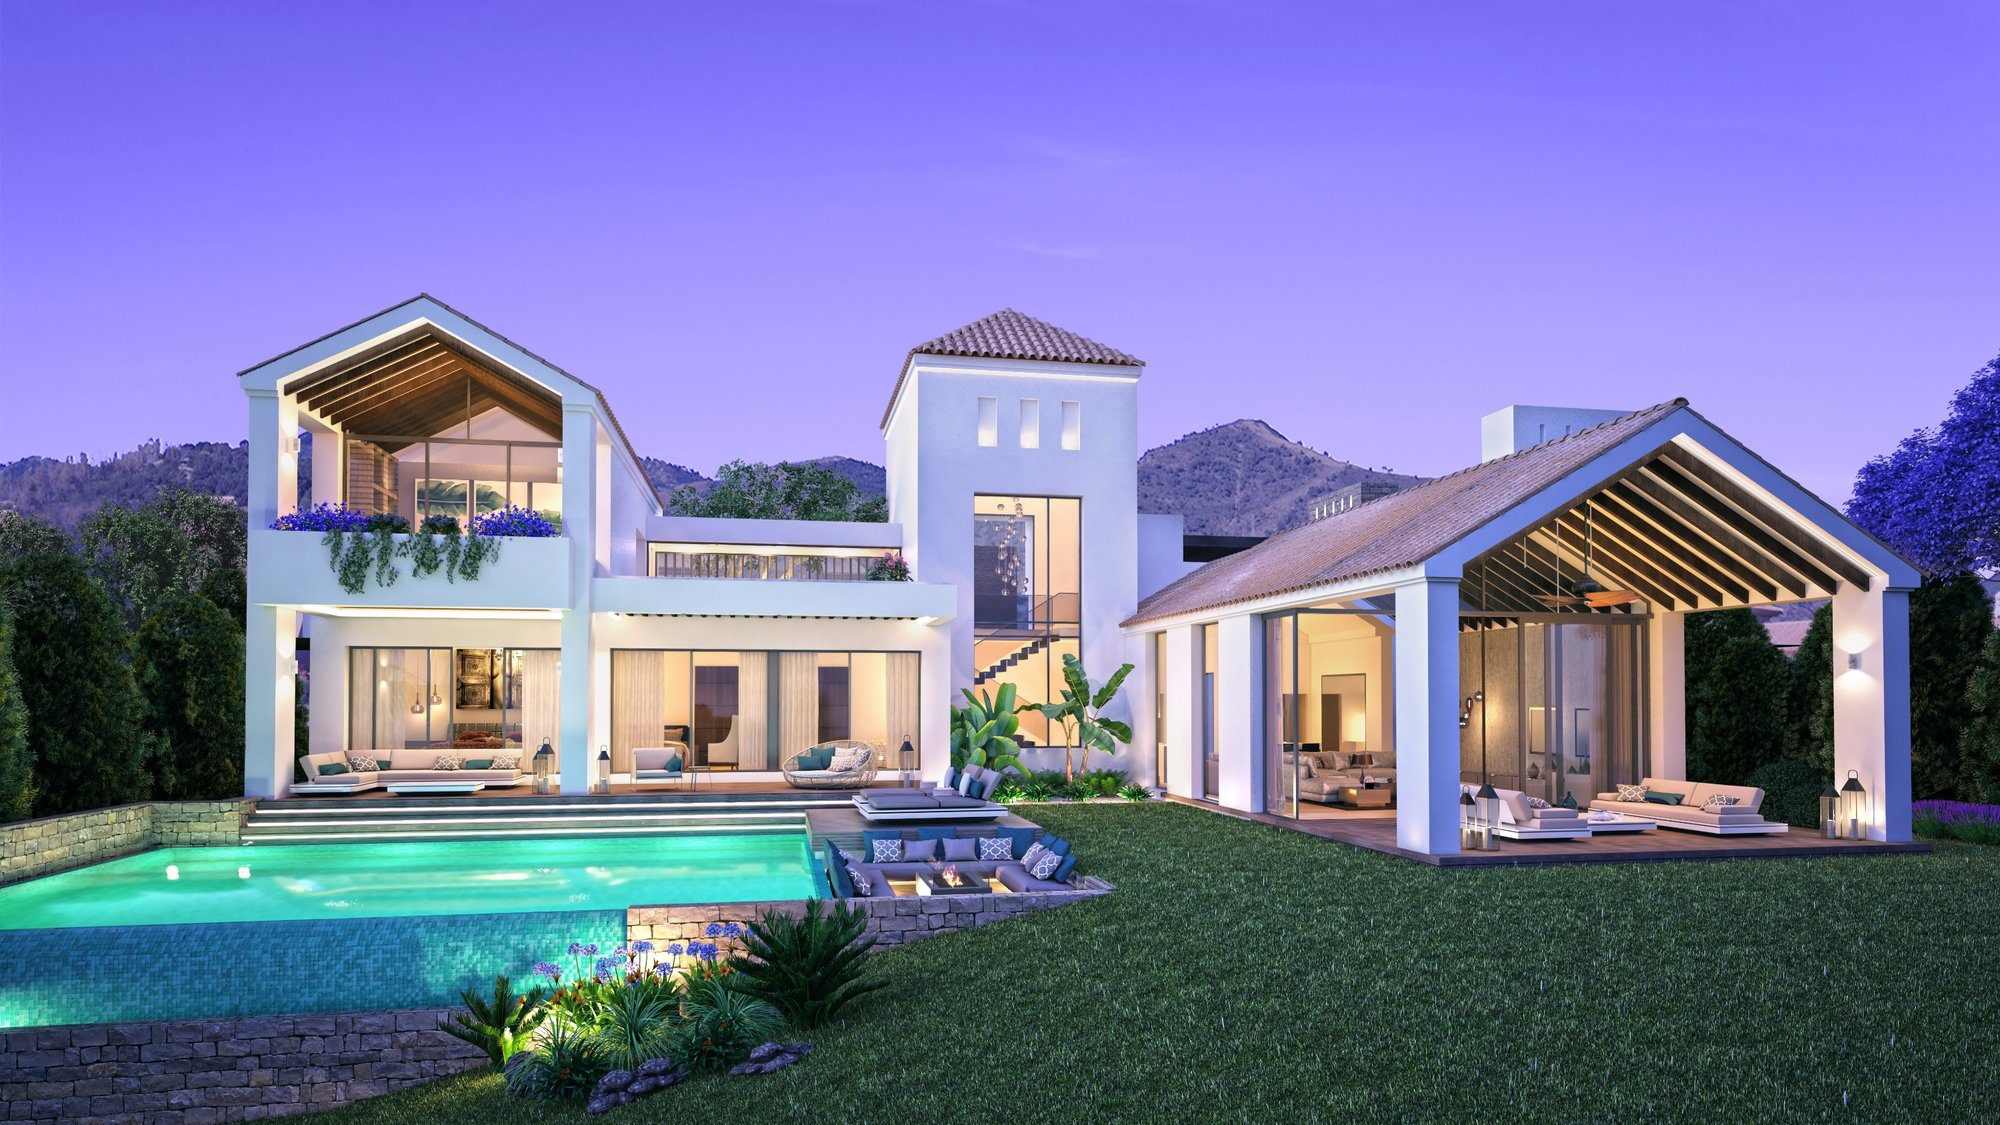 4-bed- villa for Sale in New Golden Mile